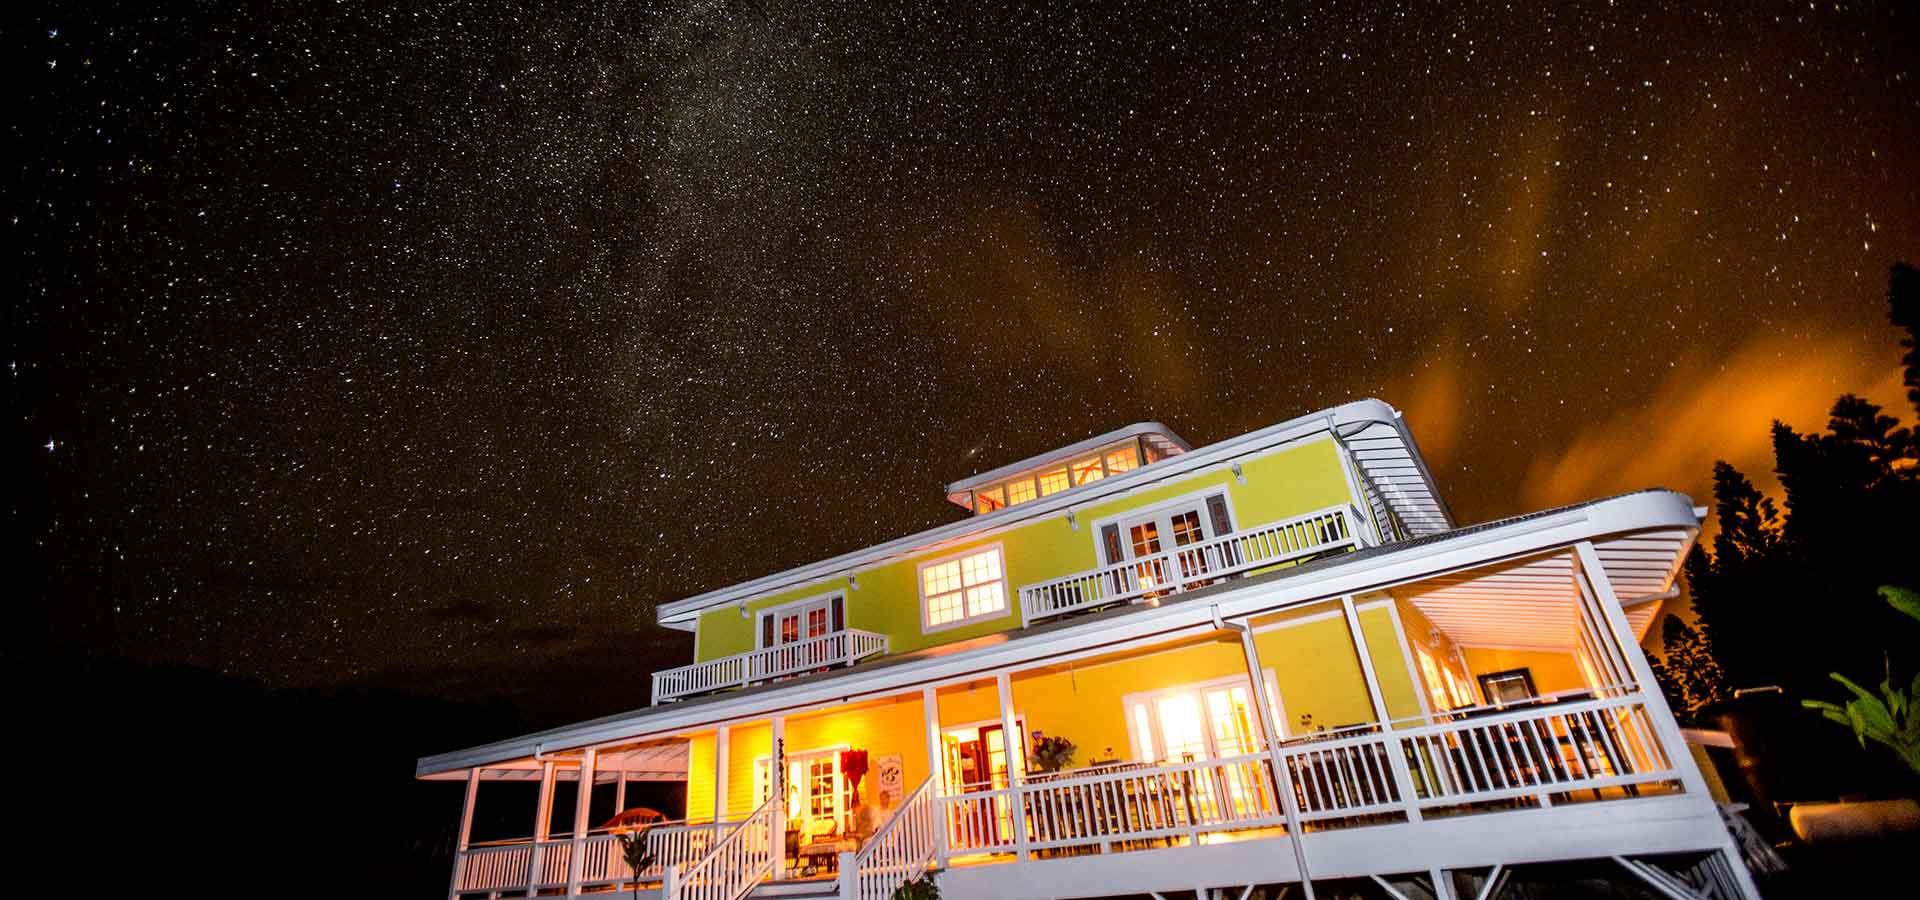 the beautiful night sky and stars at Kalaekilohana Inn & Retreat at Na`alehu, Hawaii